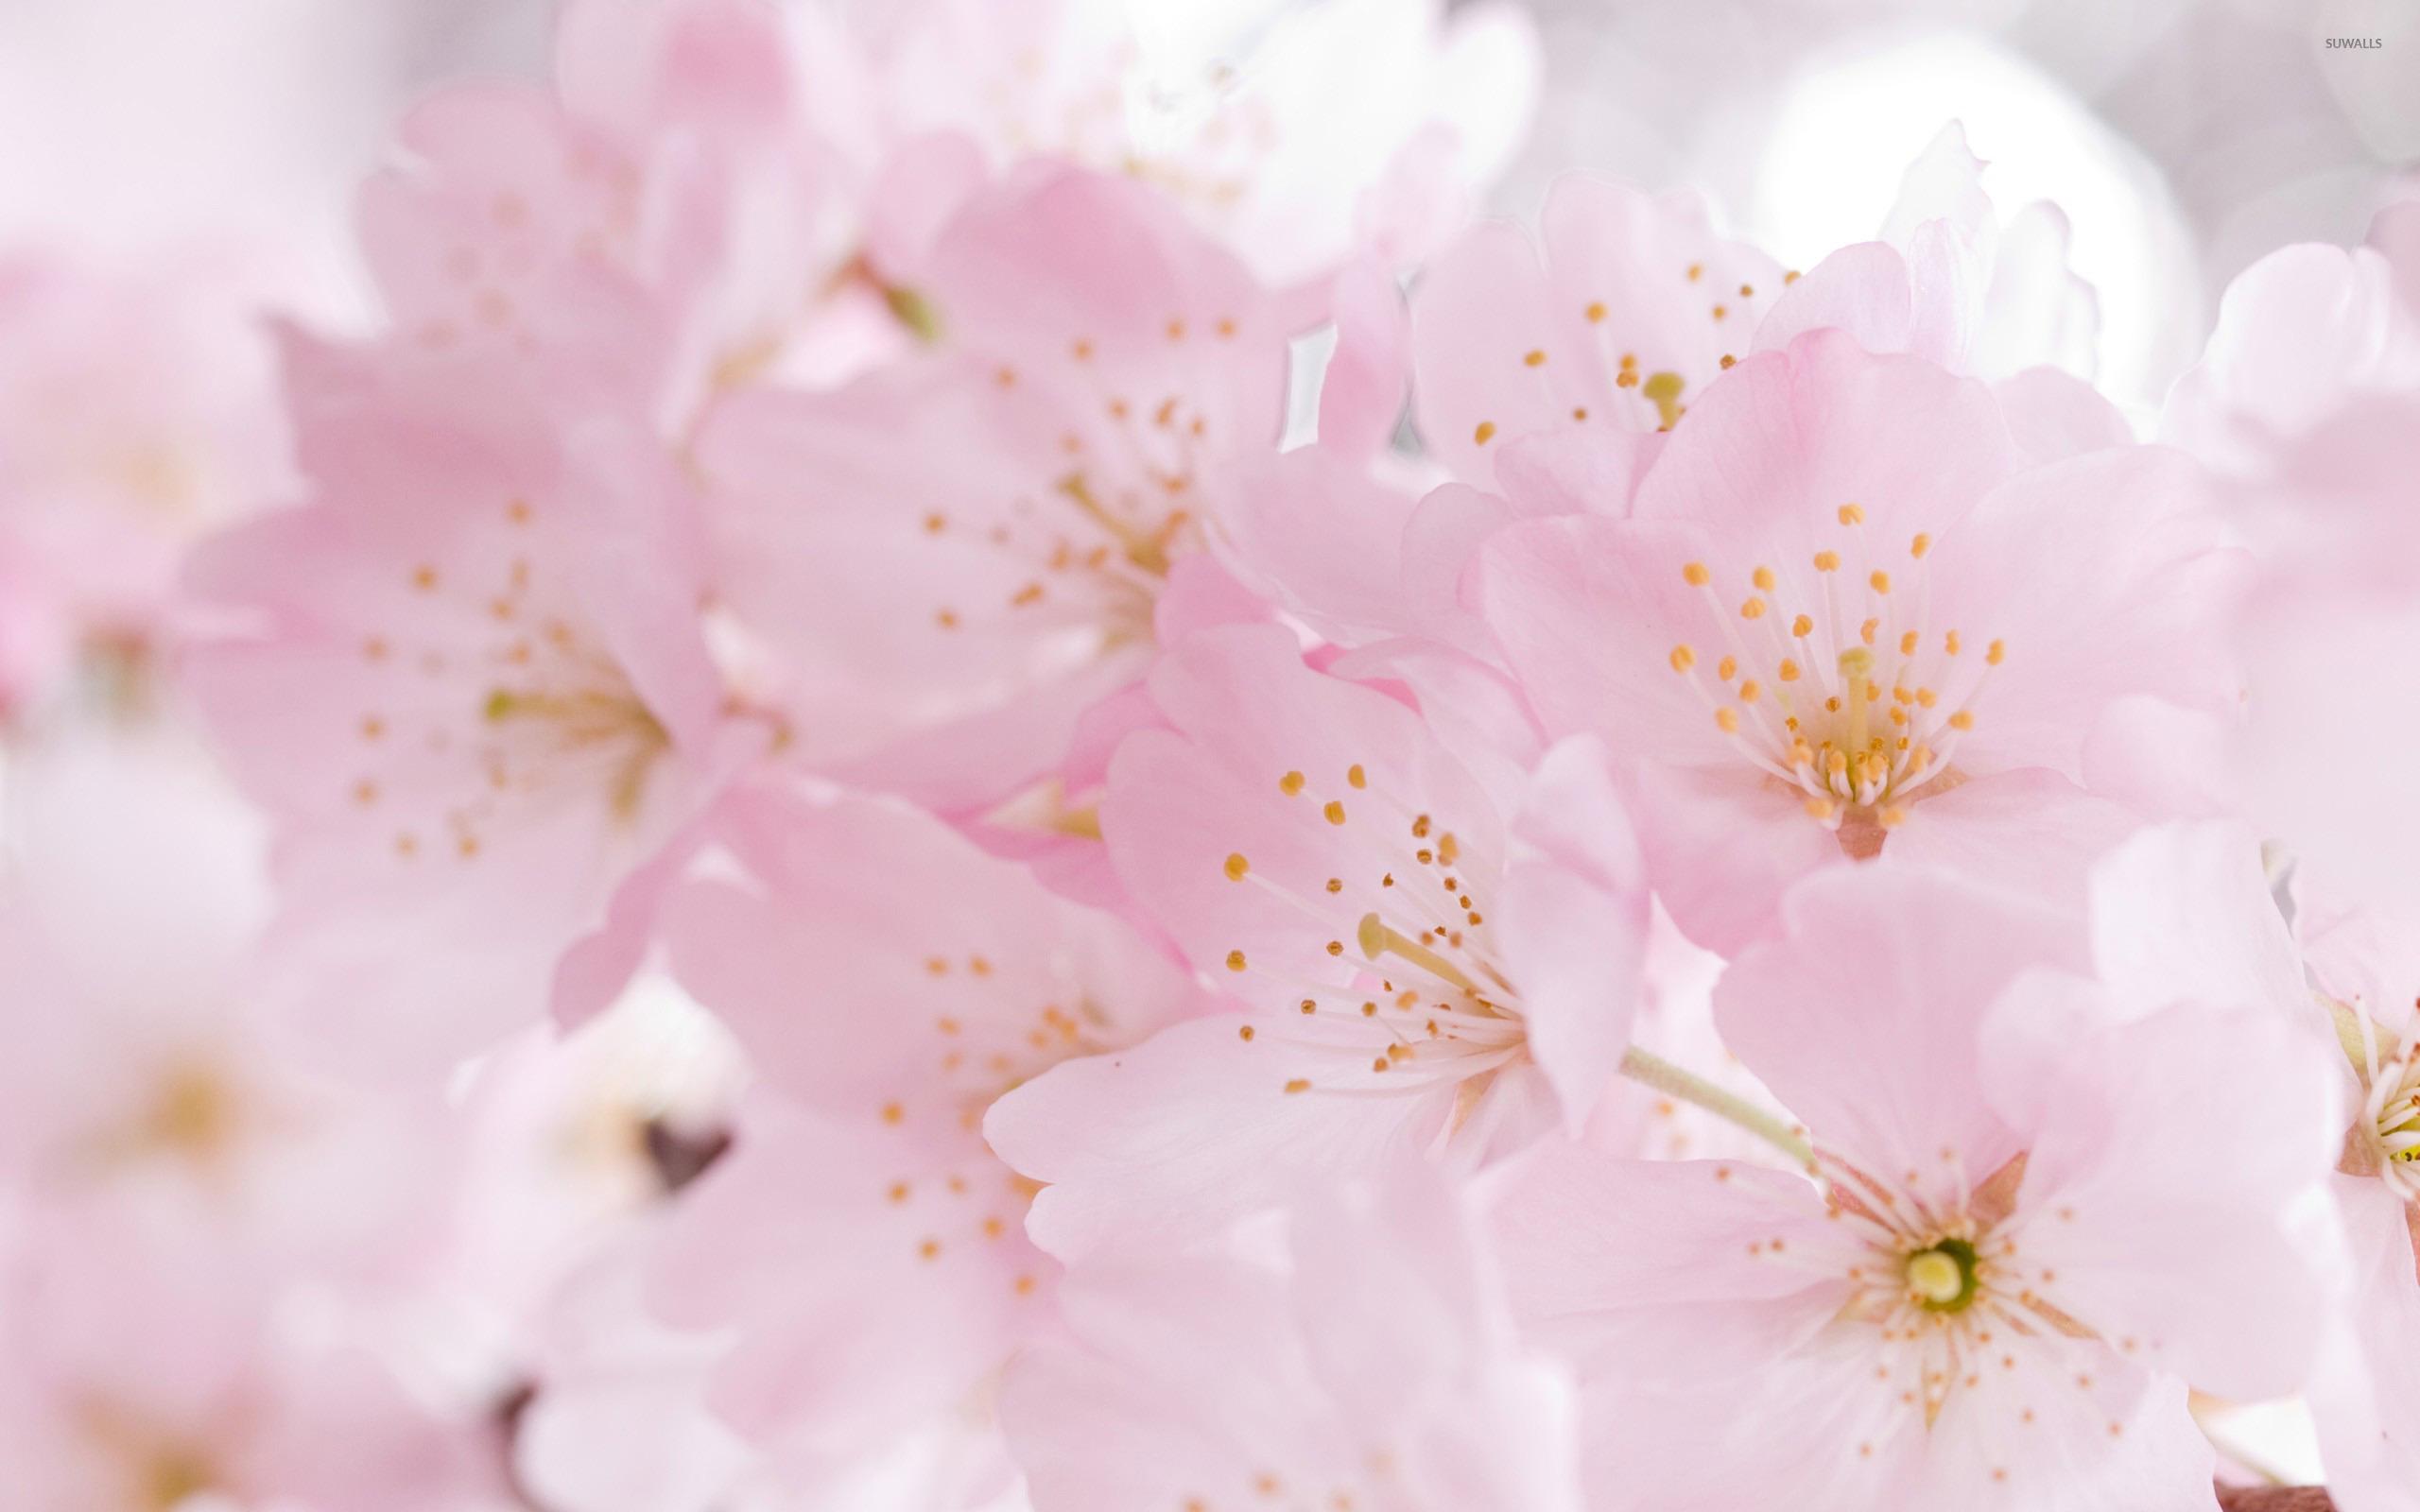 3d Blossoms Live Wallpaper Cherry Blossoms 2 Wallpaper Flower Wallpapers 21592